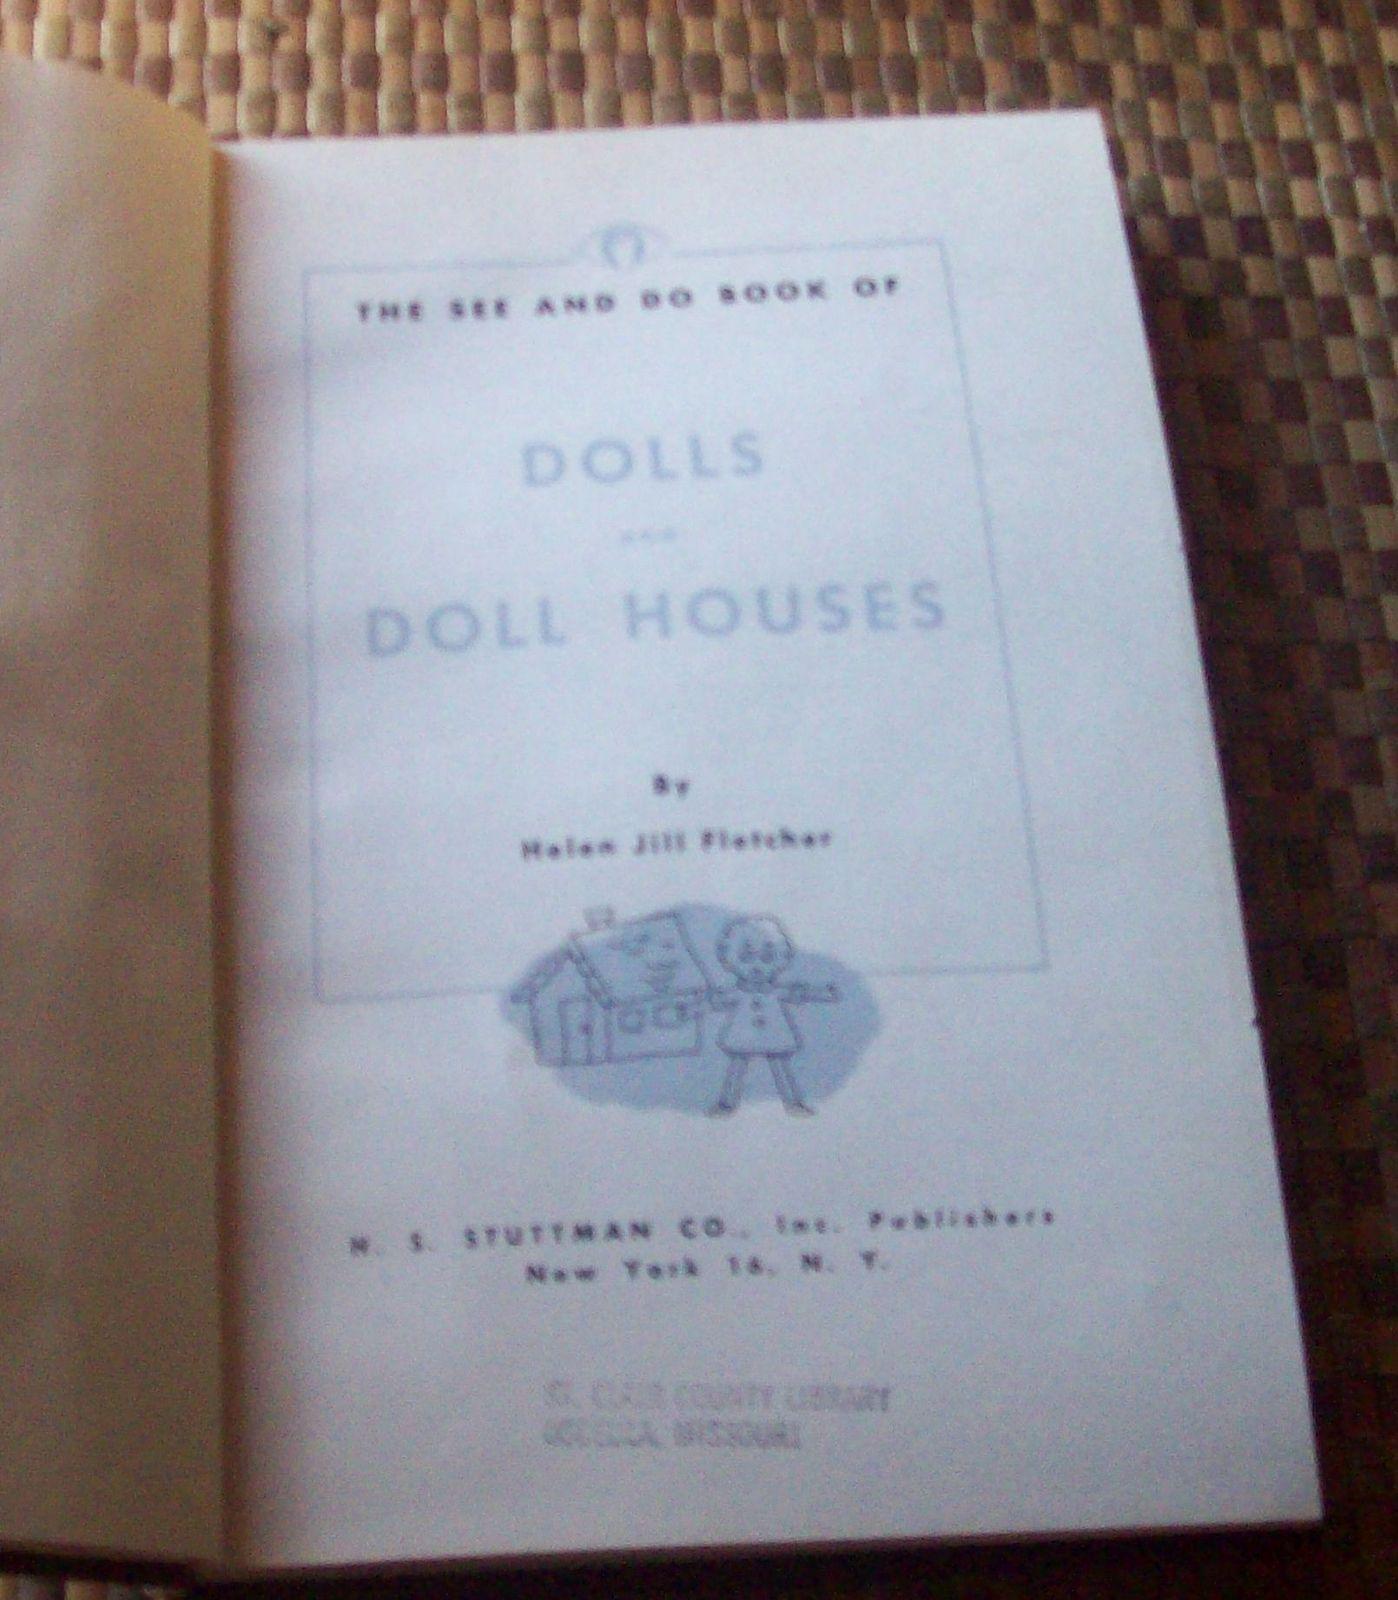 Dolls and Doll Houses by Helen Jill Fletcher 1959 HBDJ